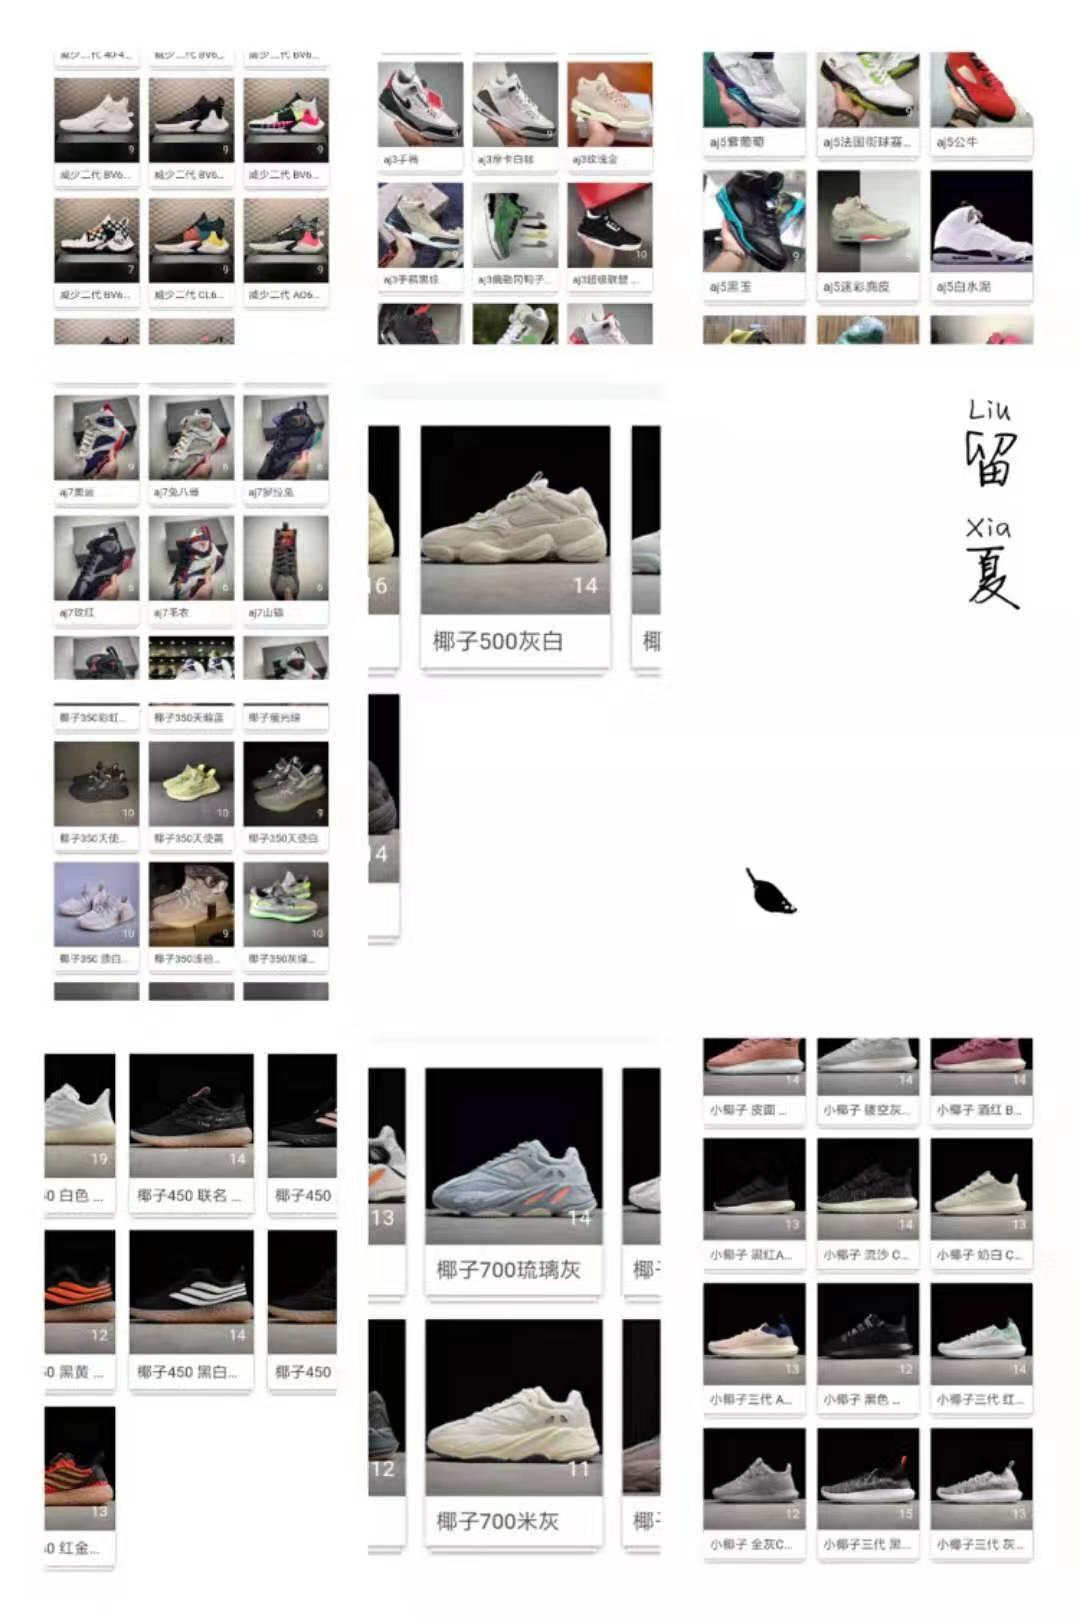 .\..\..\AppData\Local\Temp\WeChat Files\9cf1e4c9f2c6bdb20daef1520cb6f342_.jpg